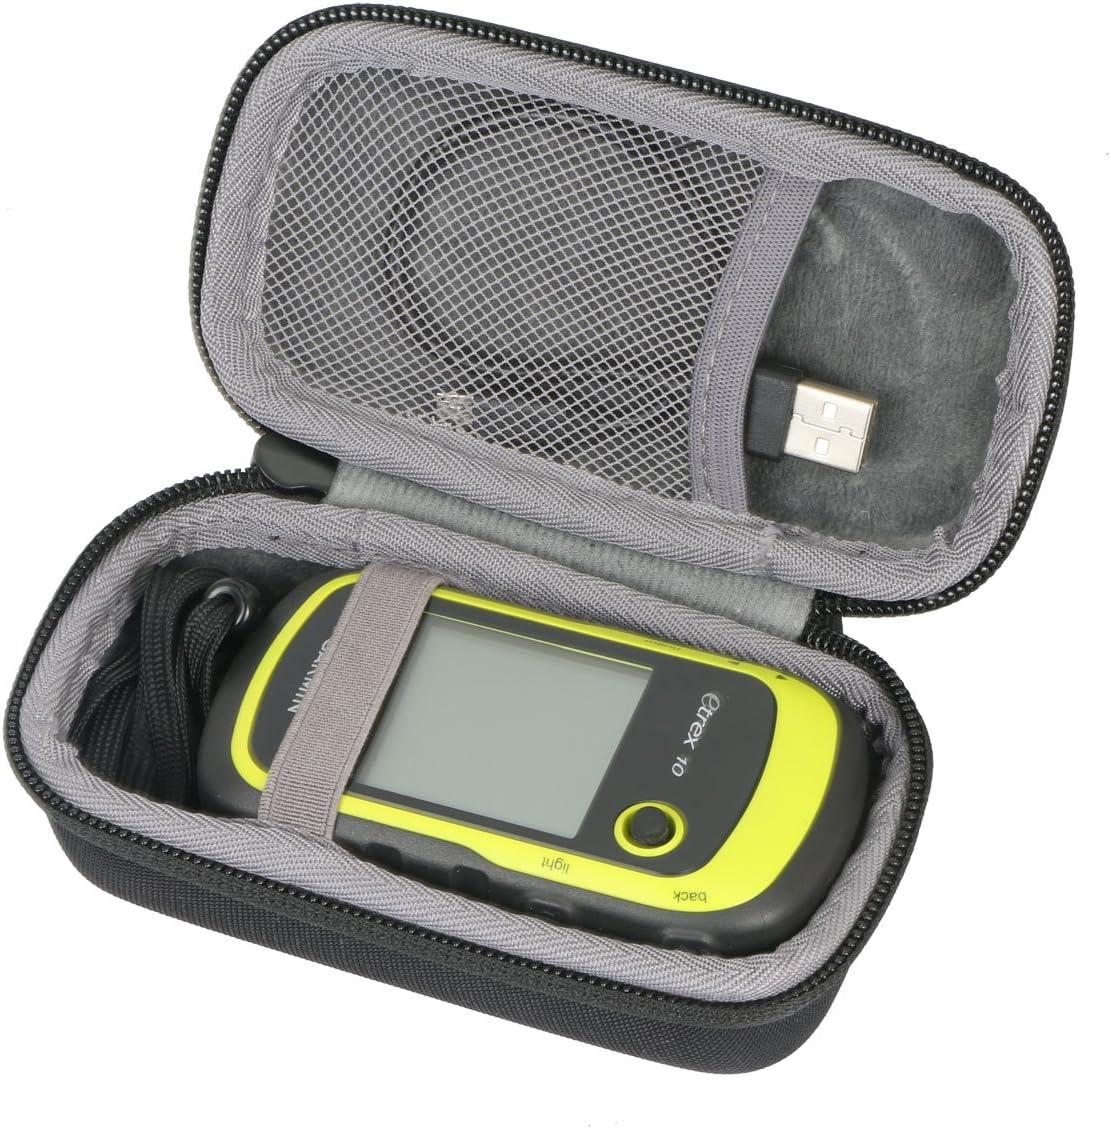 co2CREA Hard Travel Case for Garmin eTrex 10 20x 30x Worldwide Handheld GPS Navigator